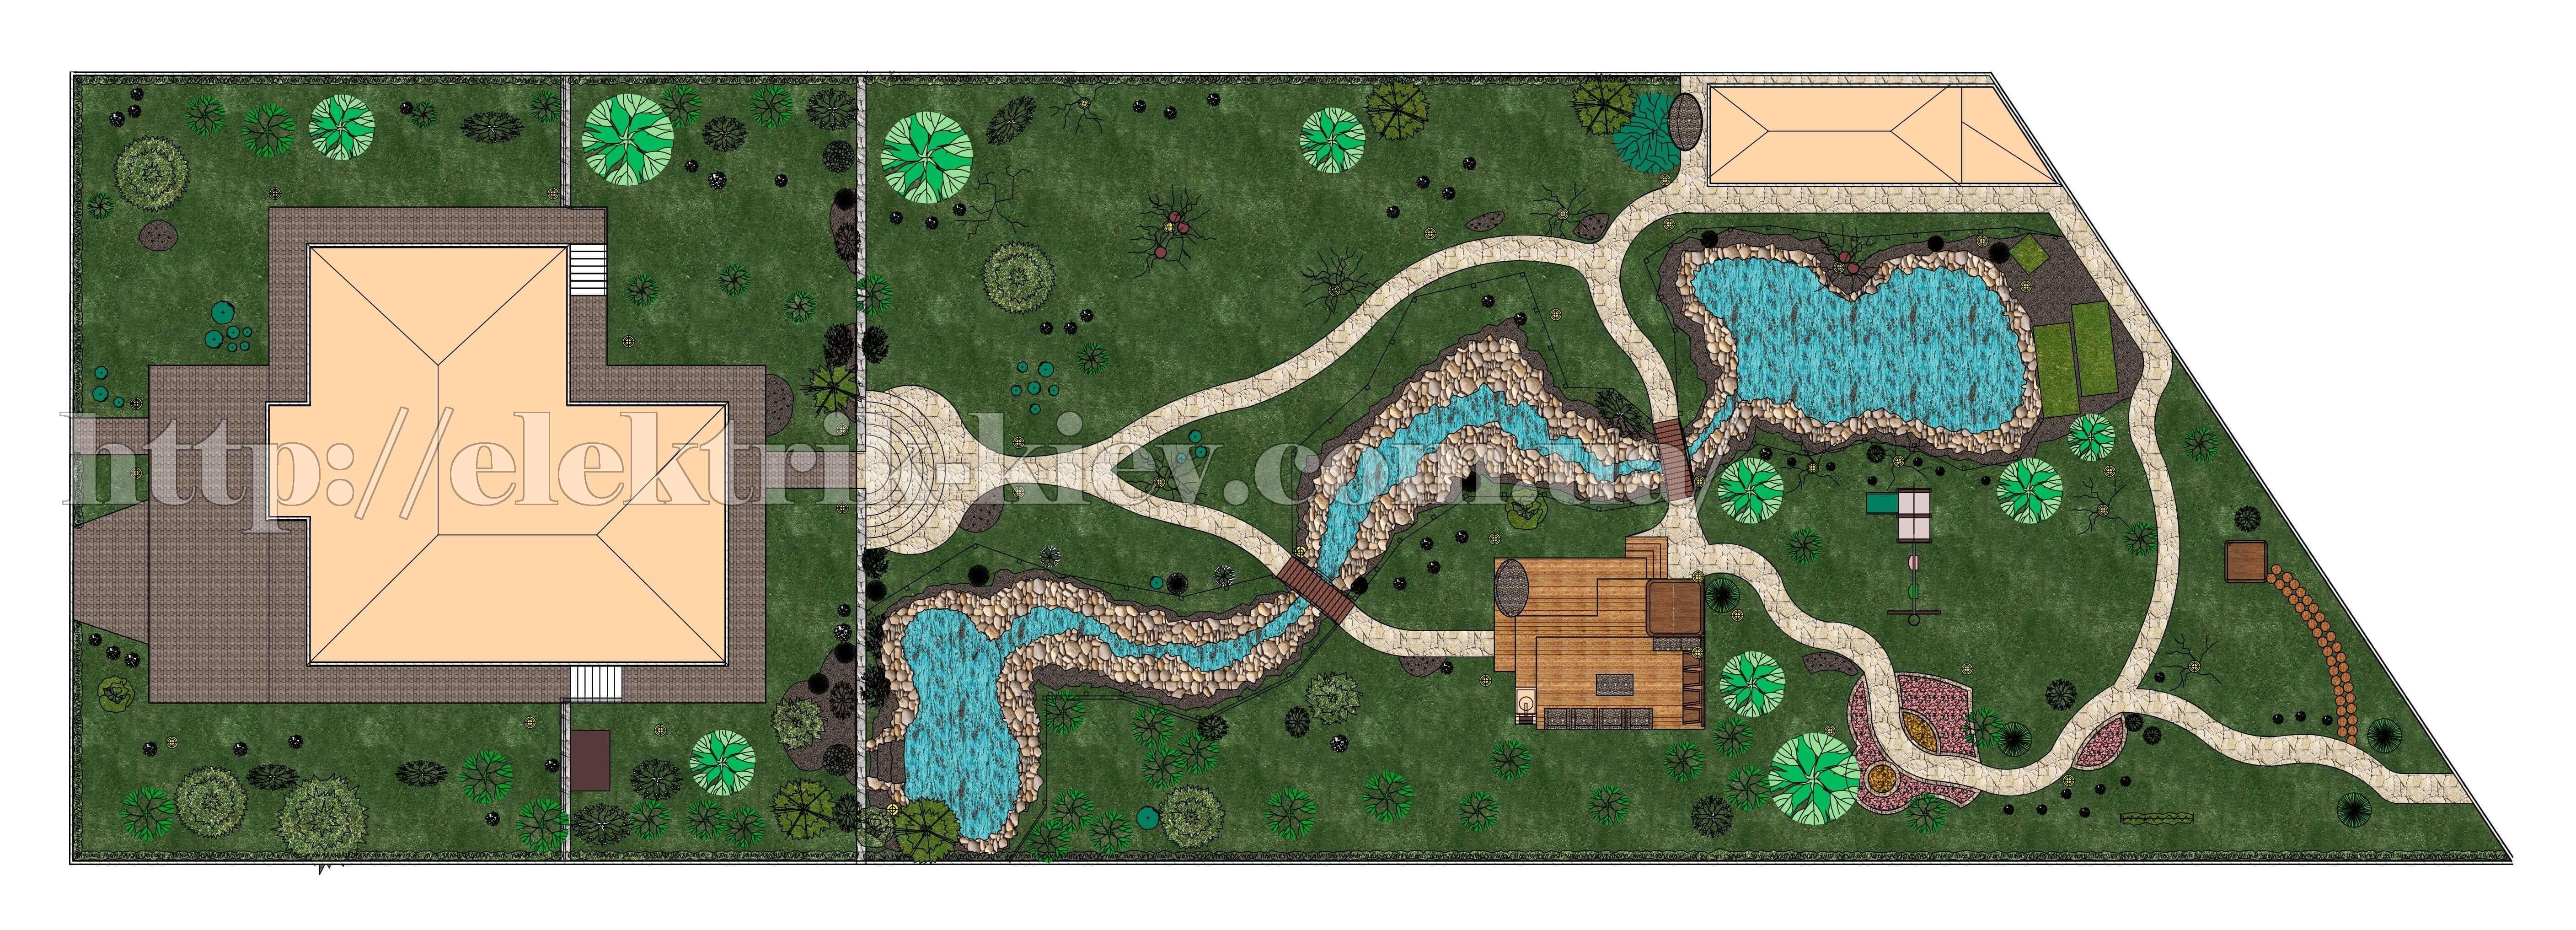 Дизайн ландшафта, проект